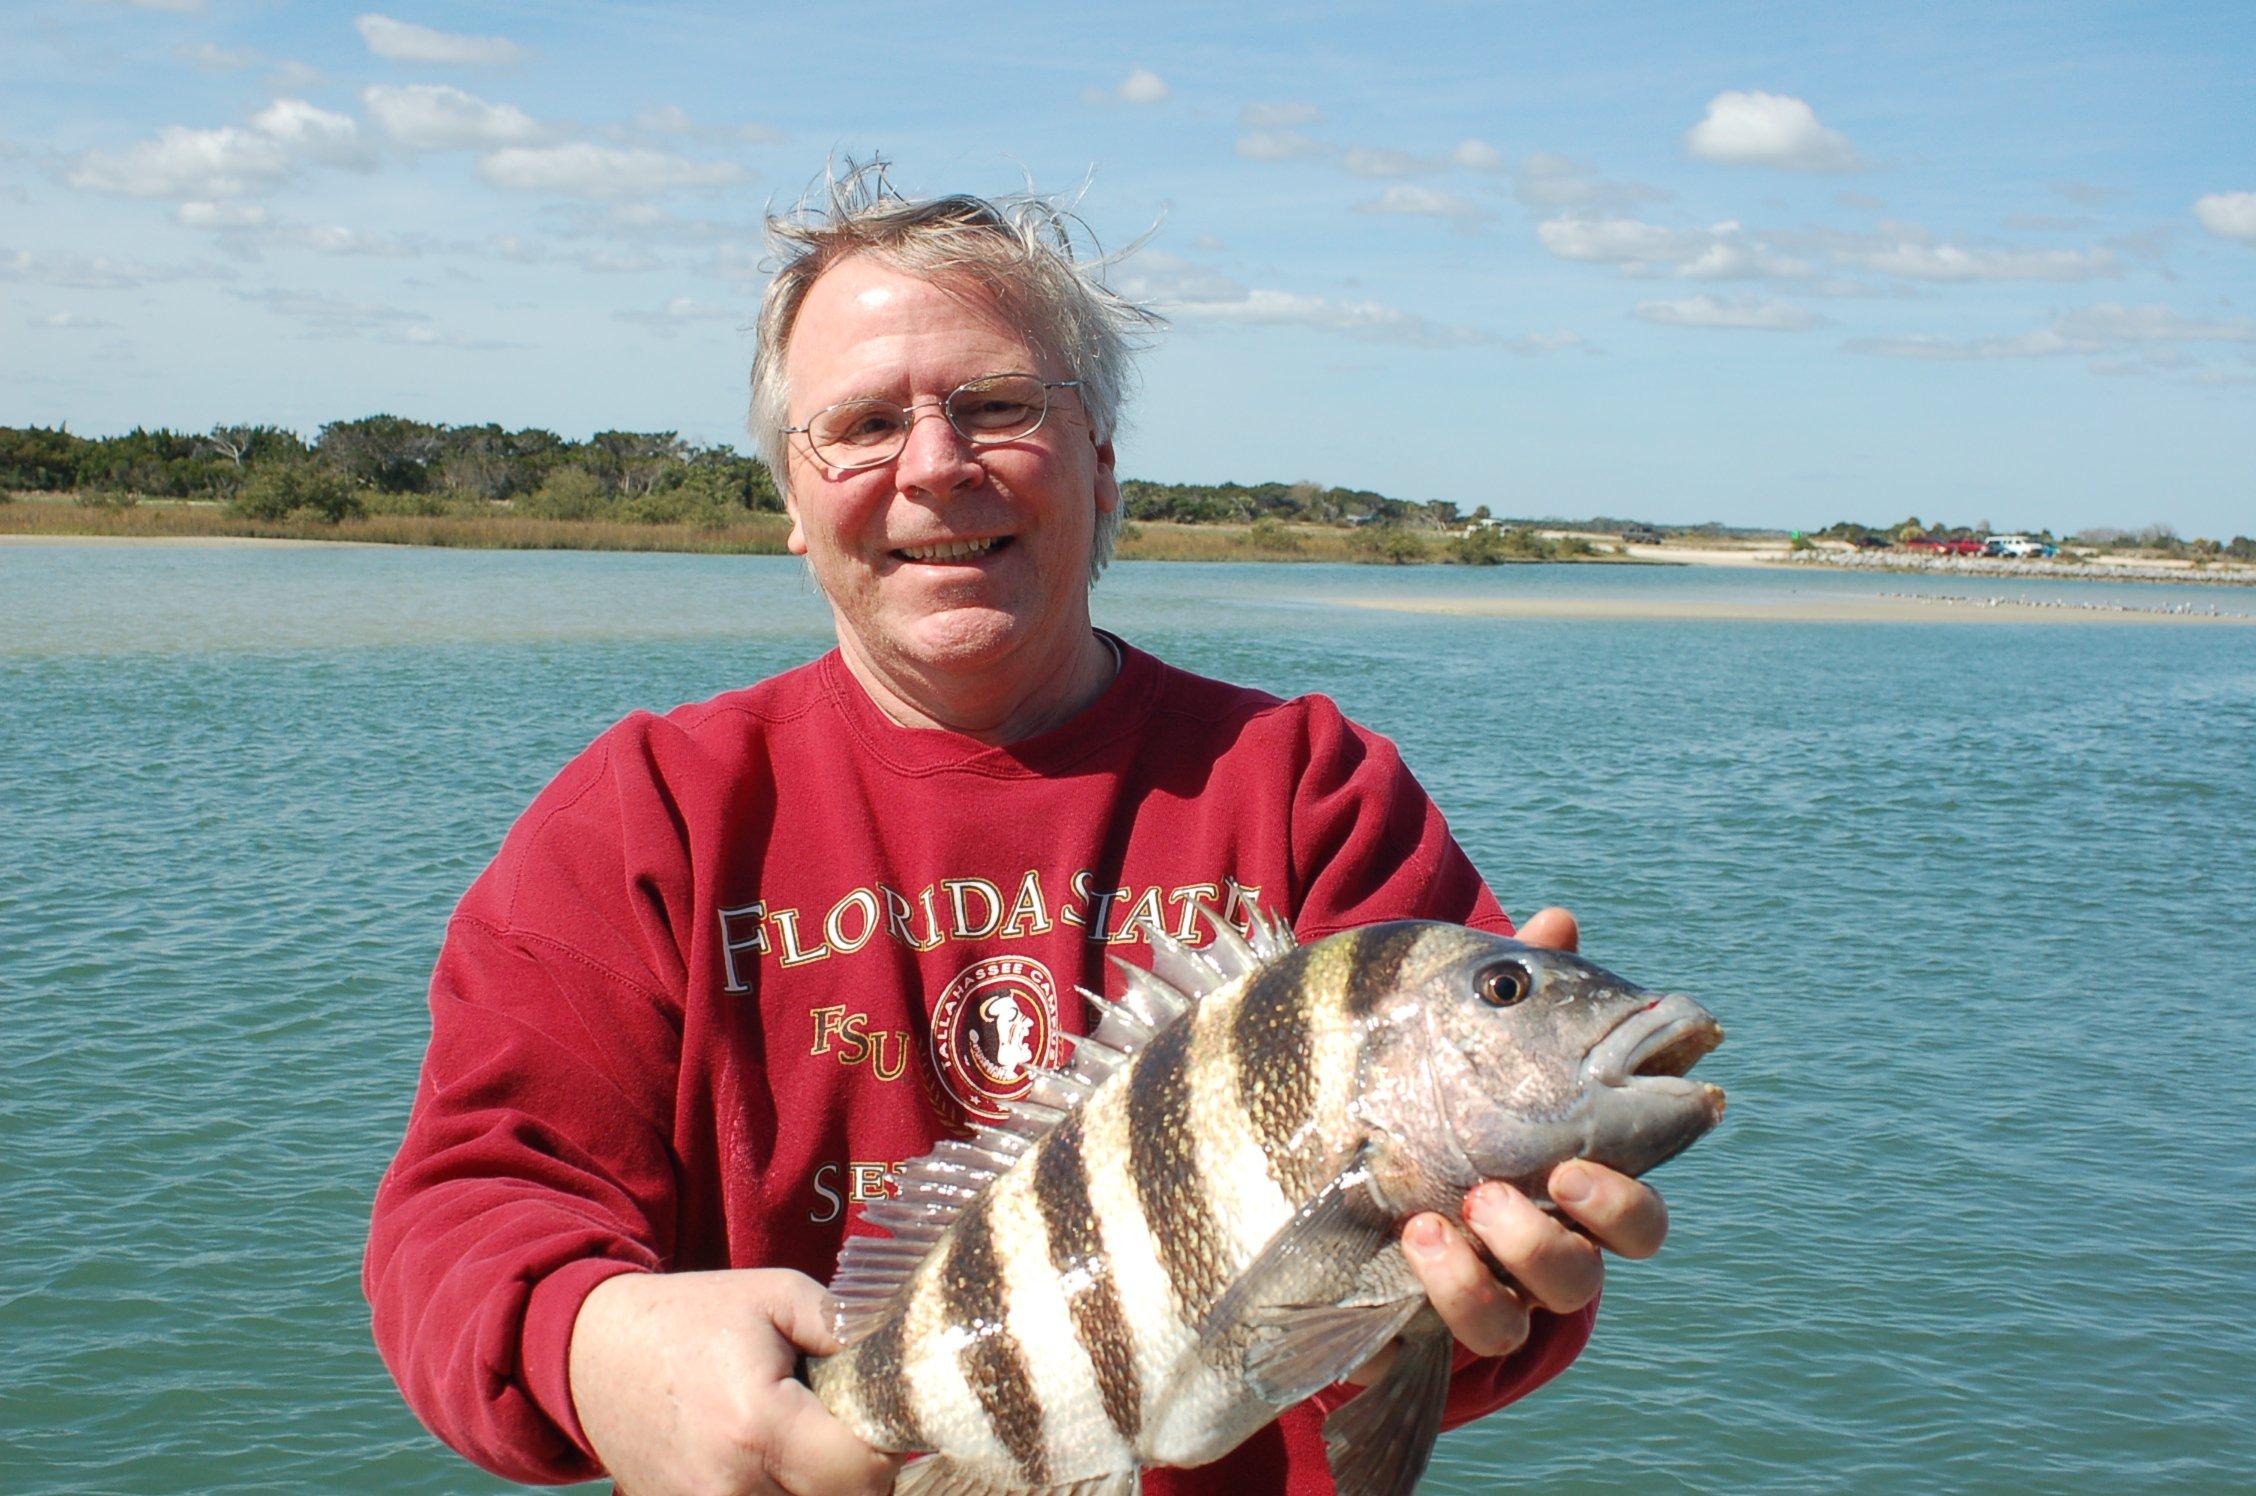 Fishing St. Augustine